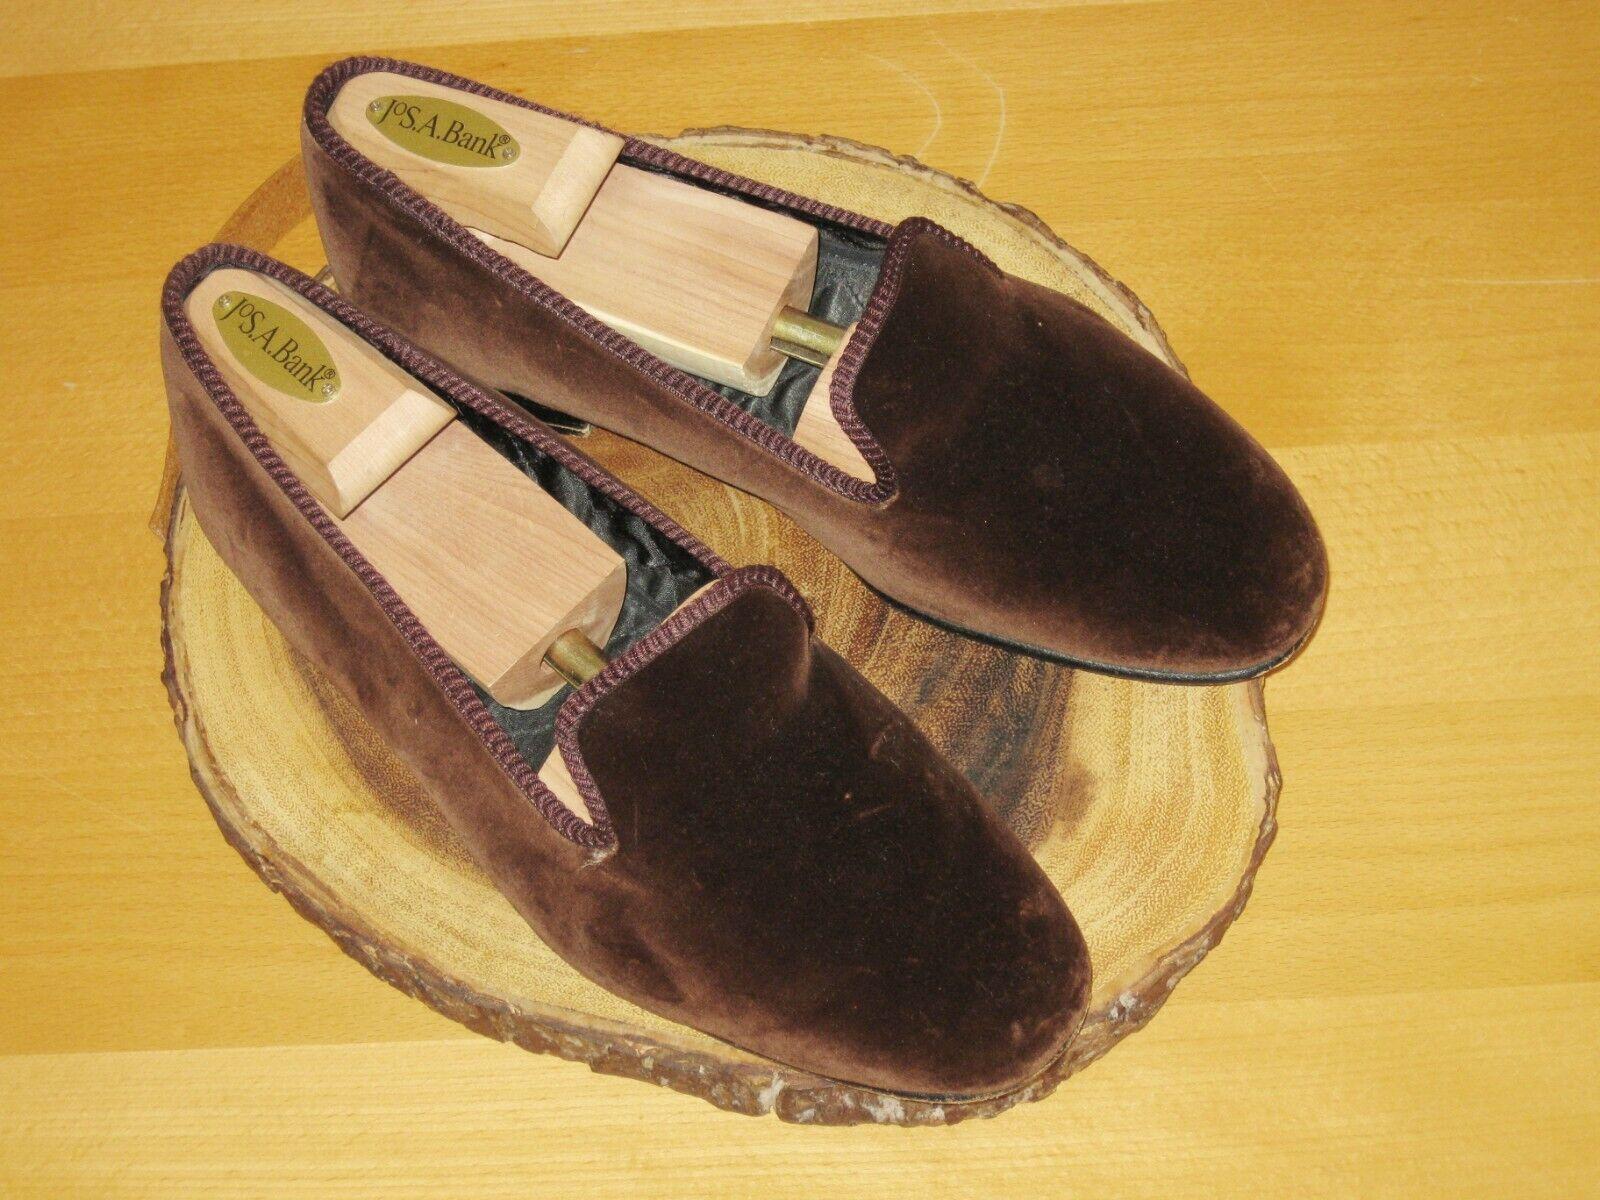 New New New & Lingwood Chocolate Brown Velvet Slippers Loafers 7.5 UK Handmade ENGLAND cb3927